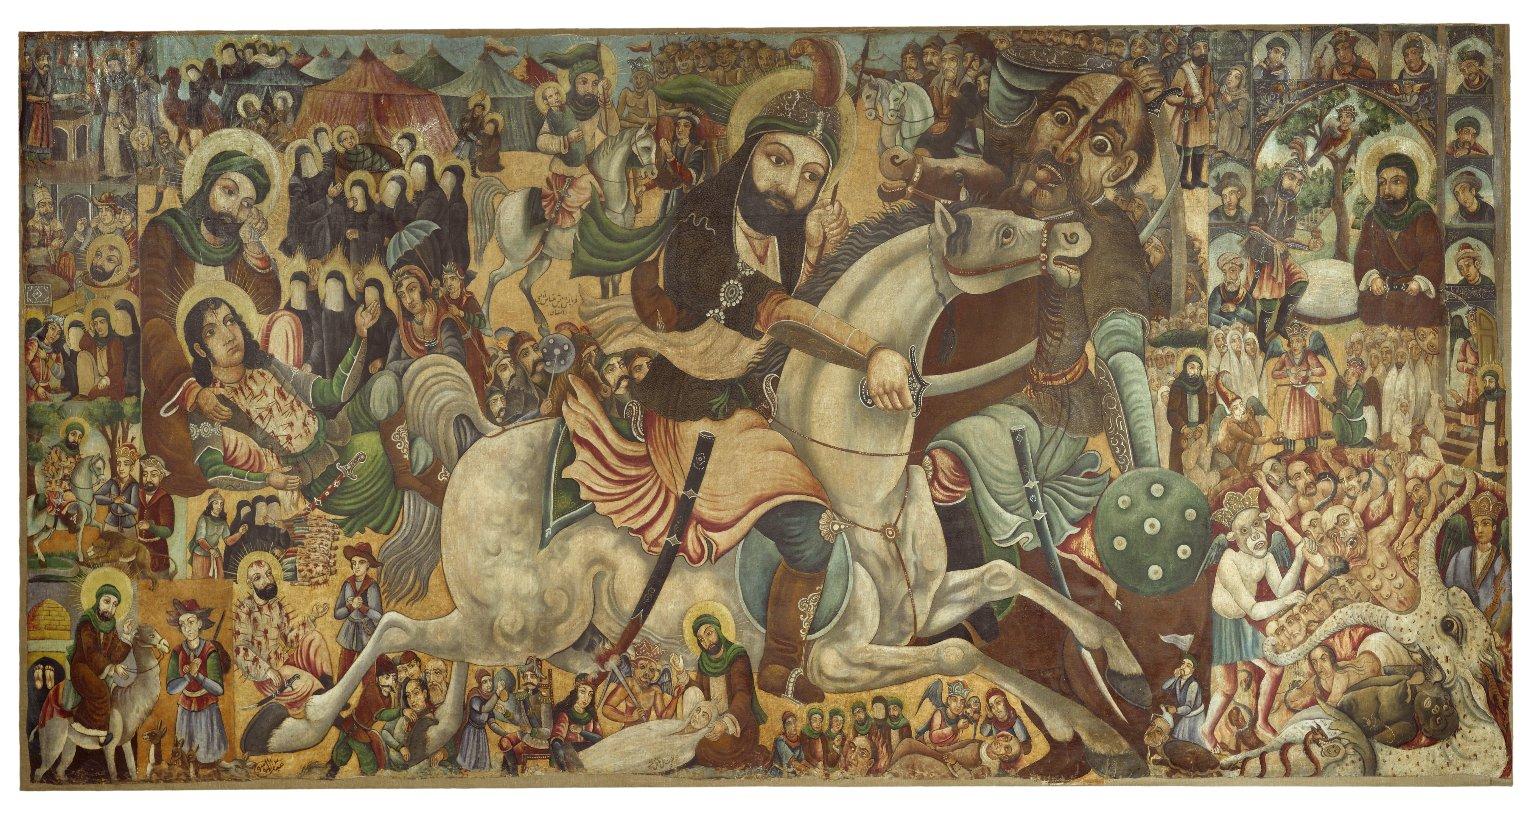 پرونده:Brooklyn Museum - Battle of Karbala - Abbas Al-Musavi - overall.jpg